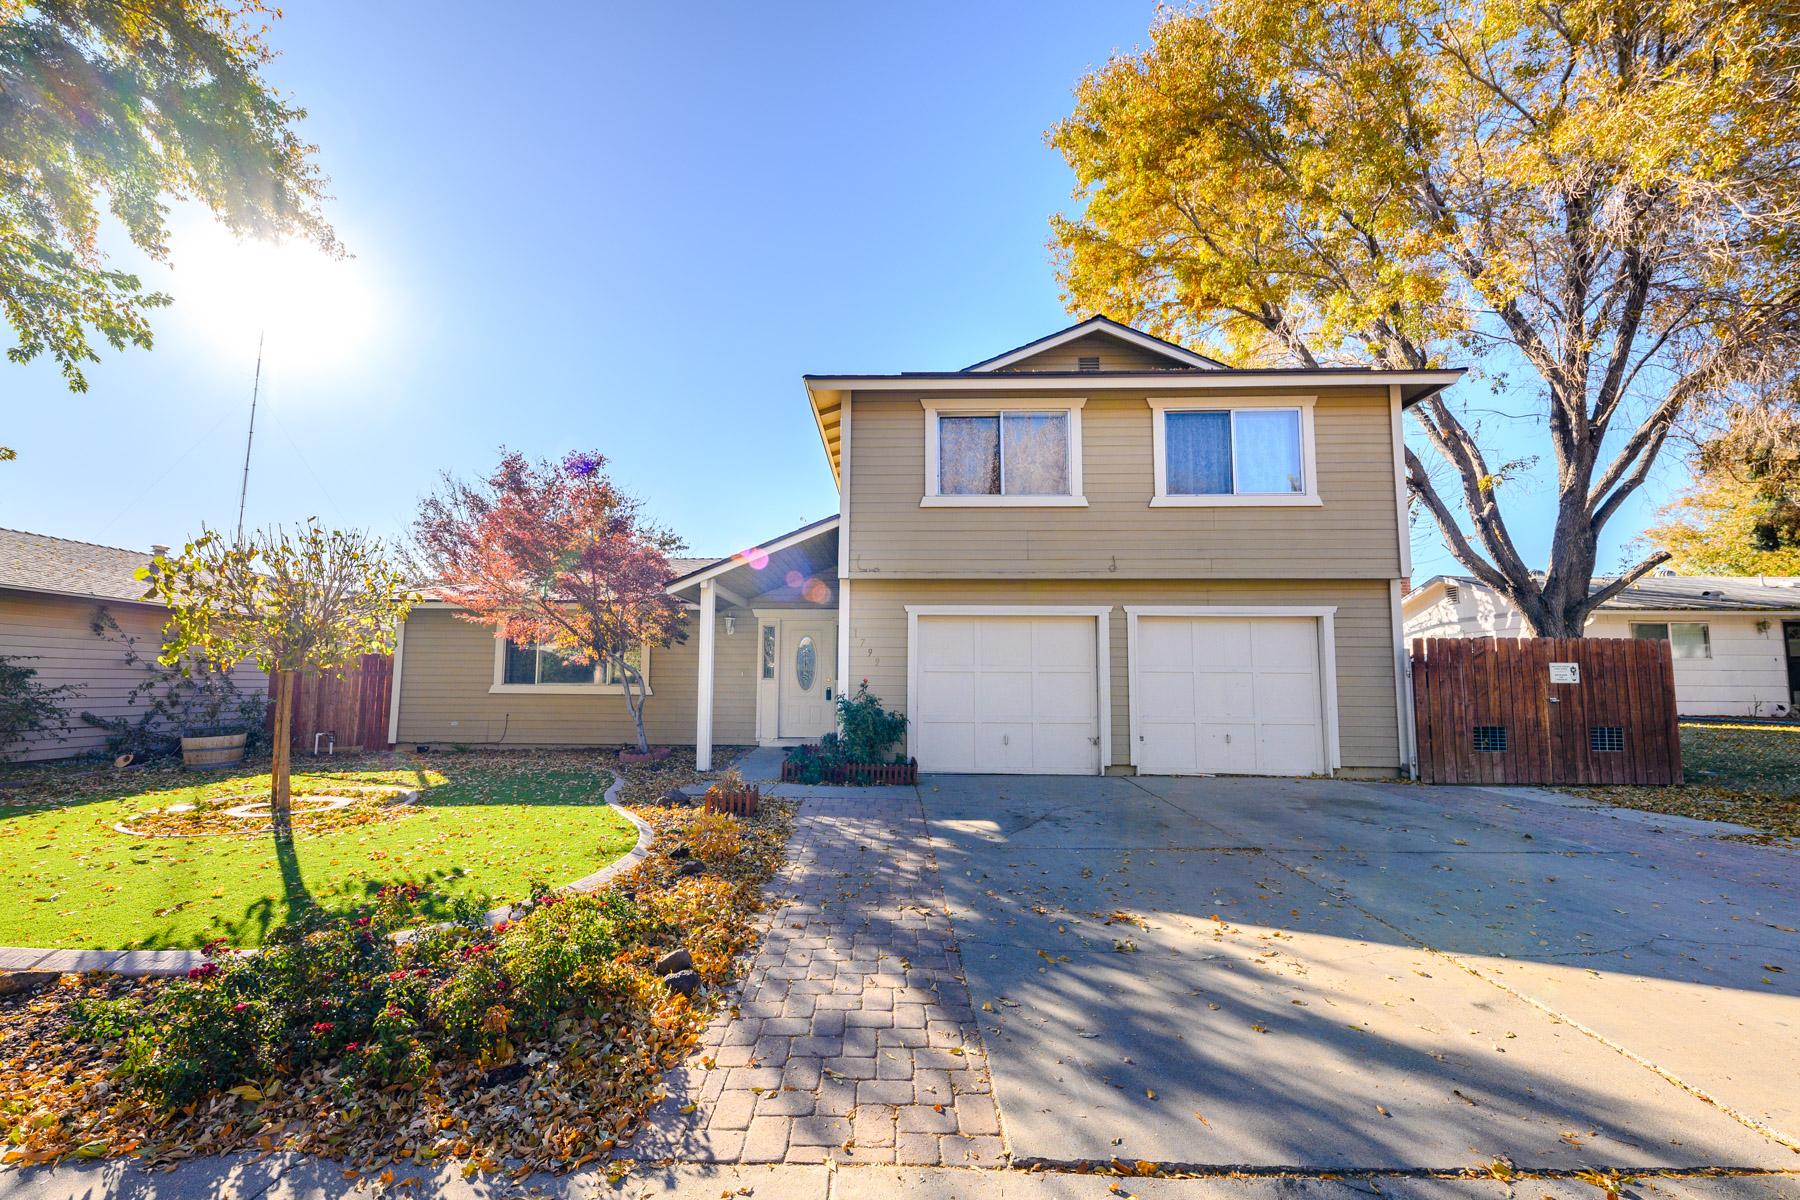 Property 为 销售 在 1799 Matteoni Drive, Sparks NV, 89434 1799 Matteoni Drive 斯帕克斯, 内华达州 89434 美国